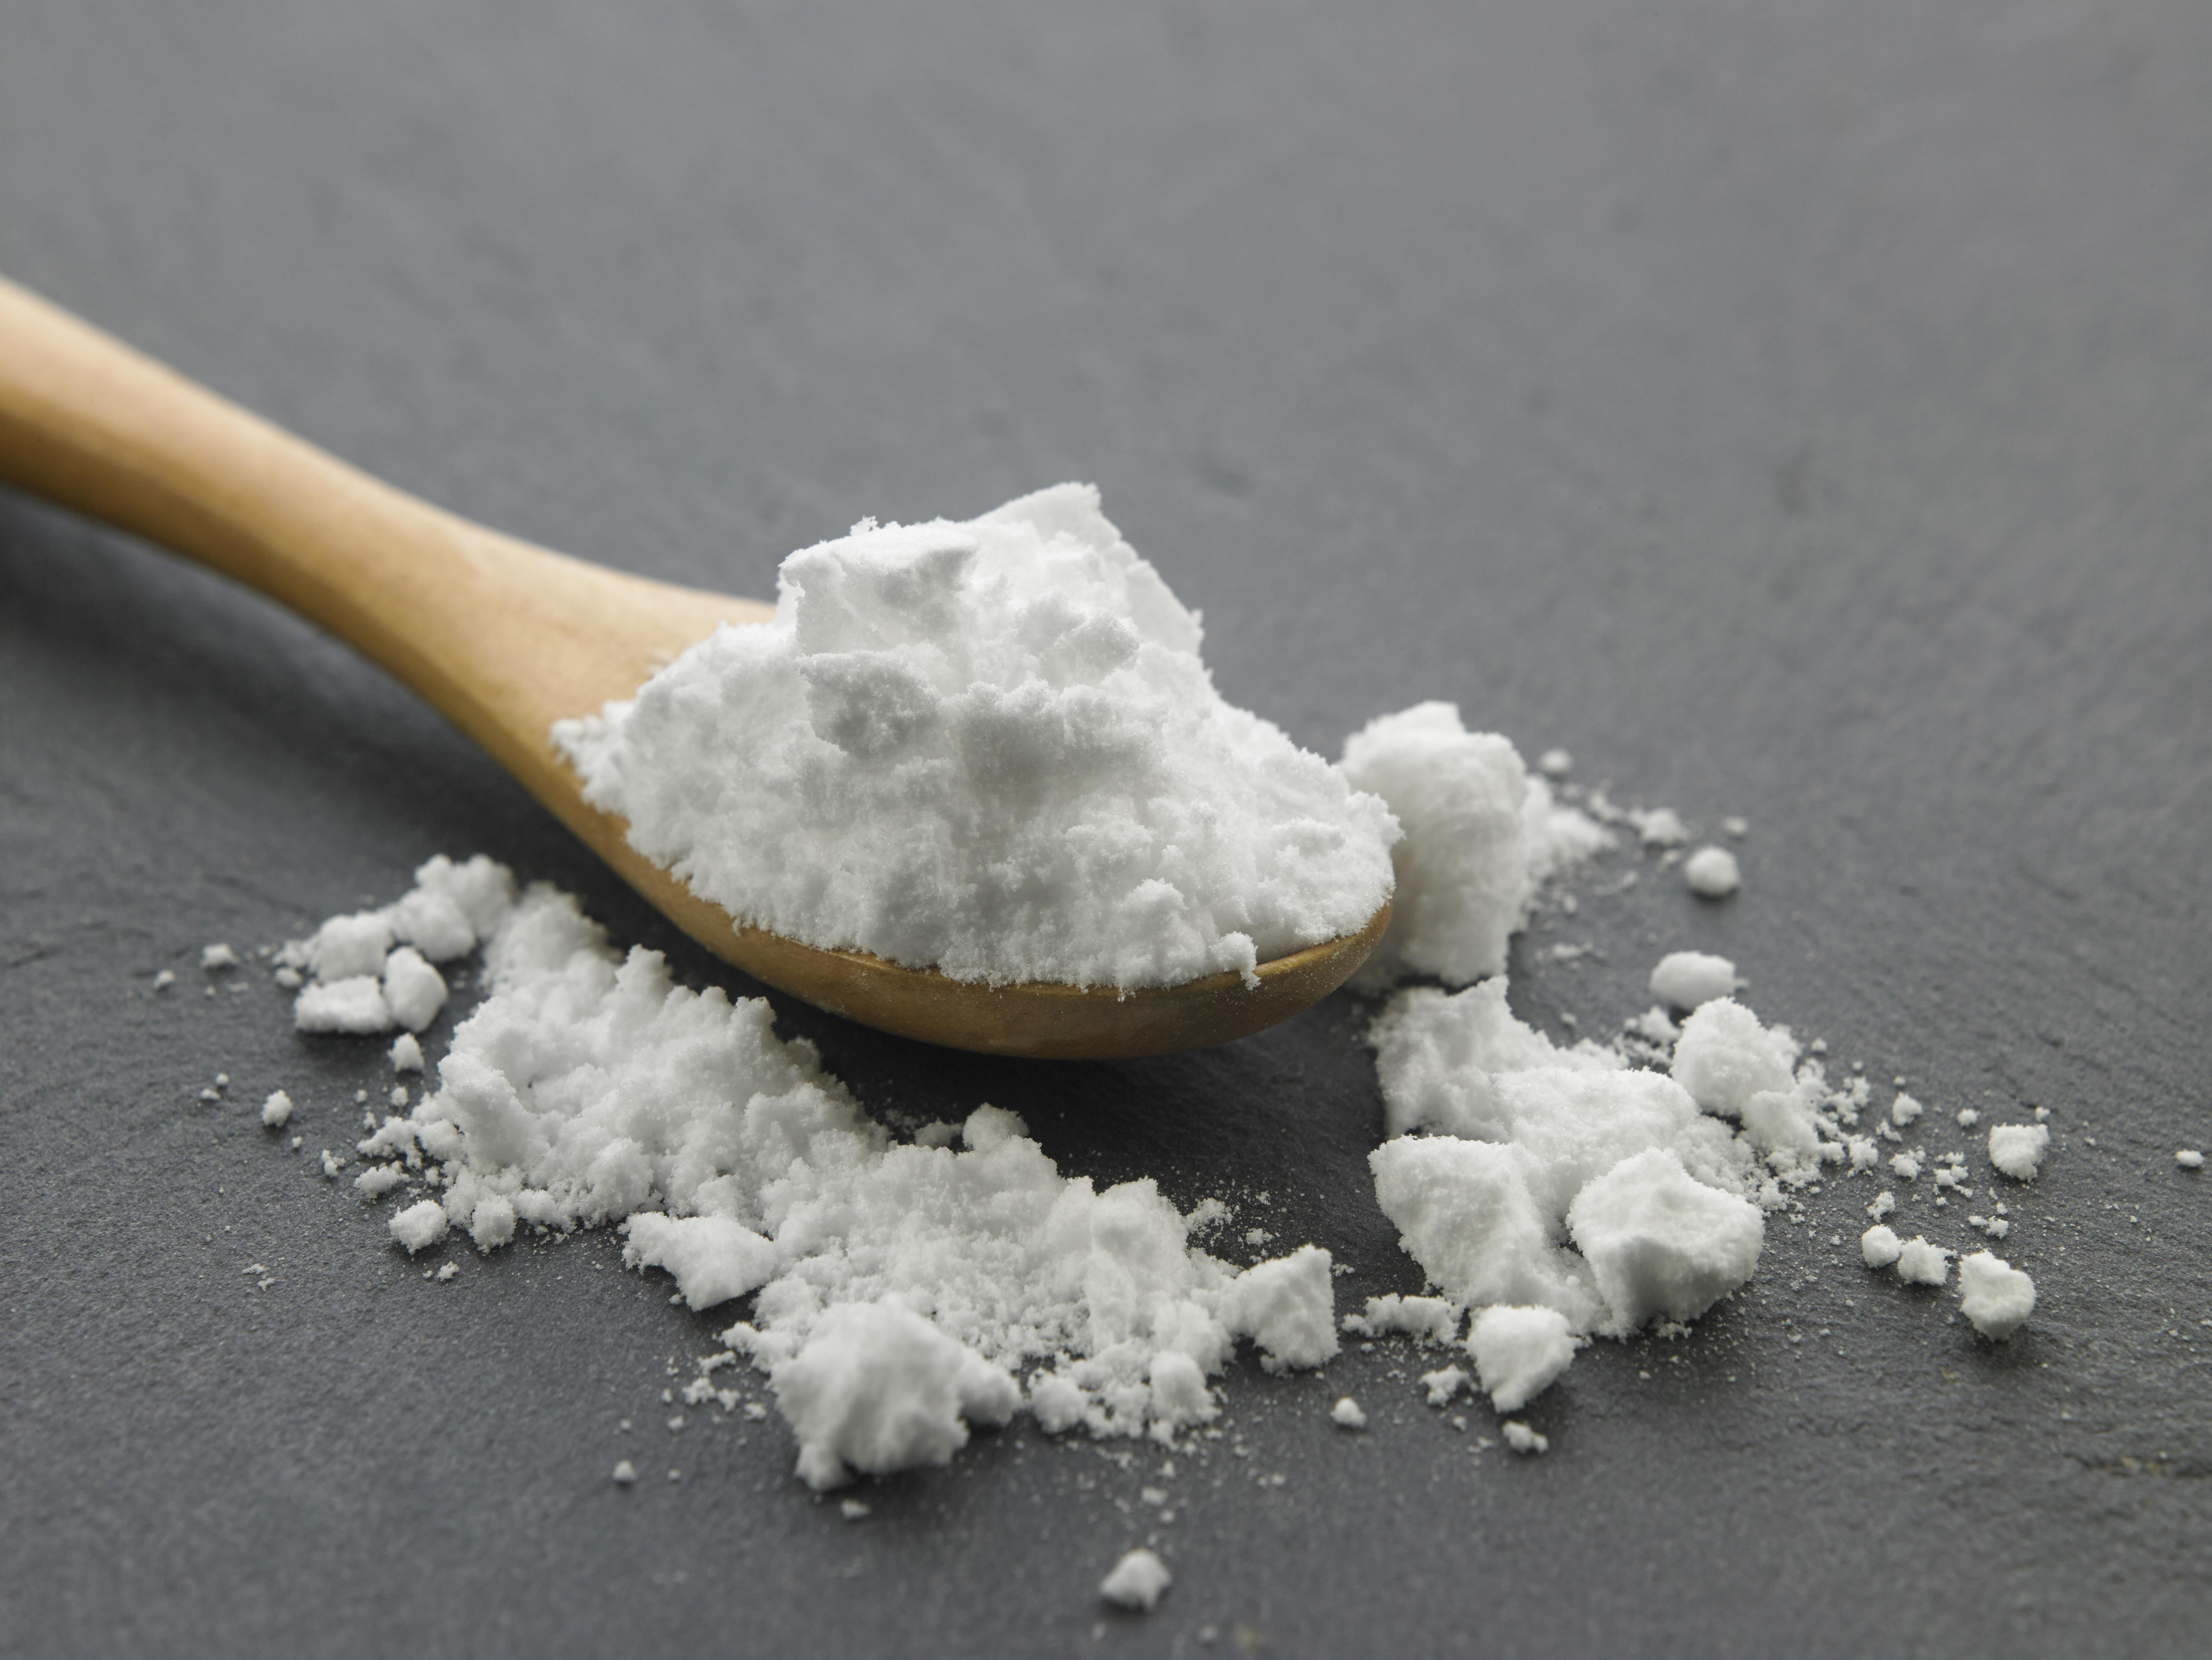 How to Make Borax Powder